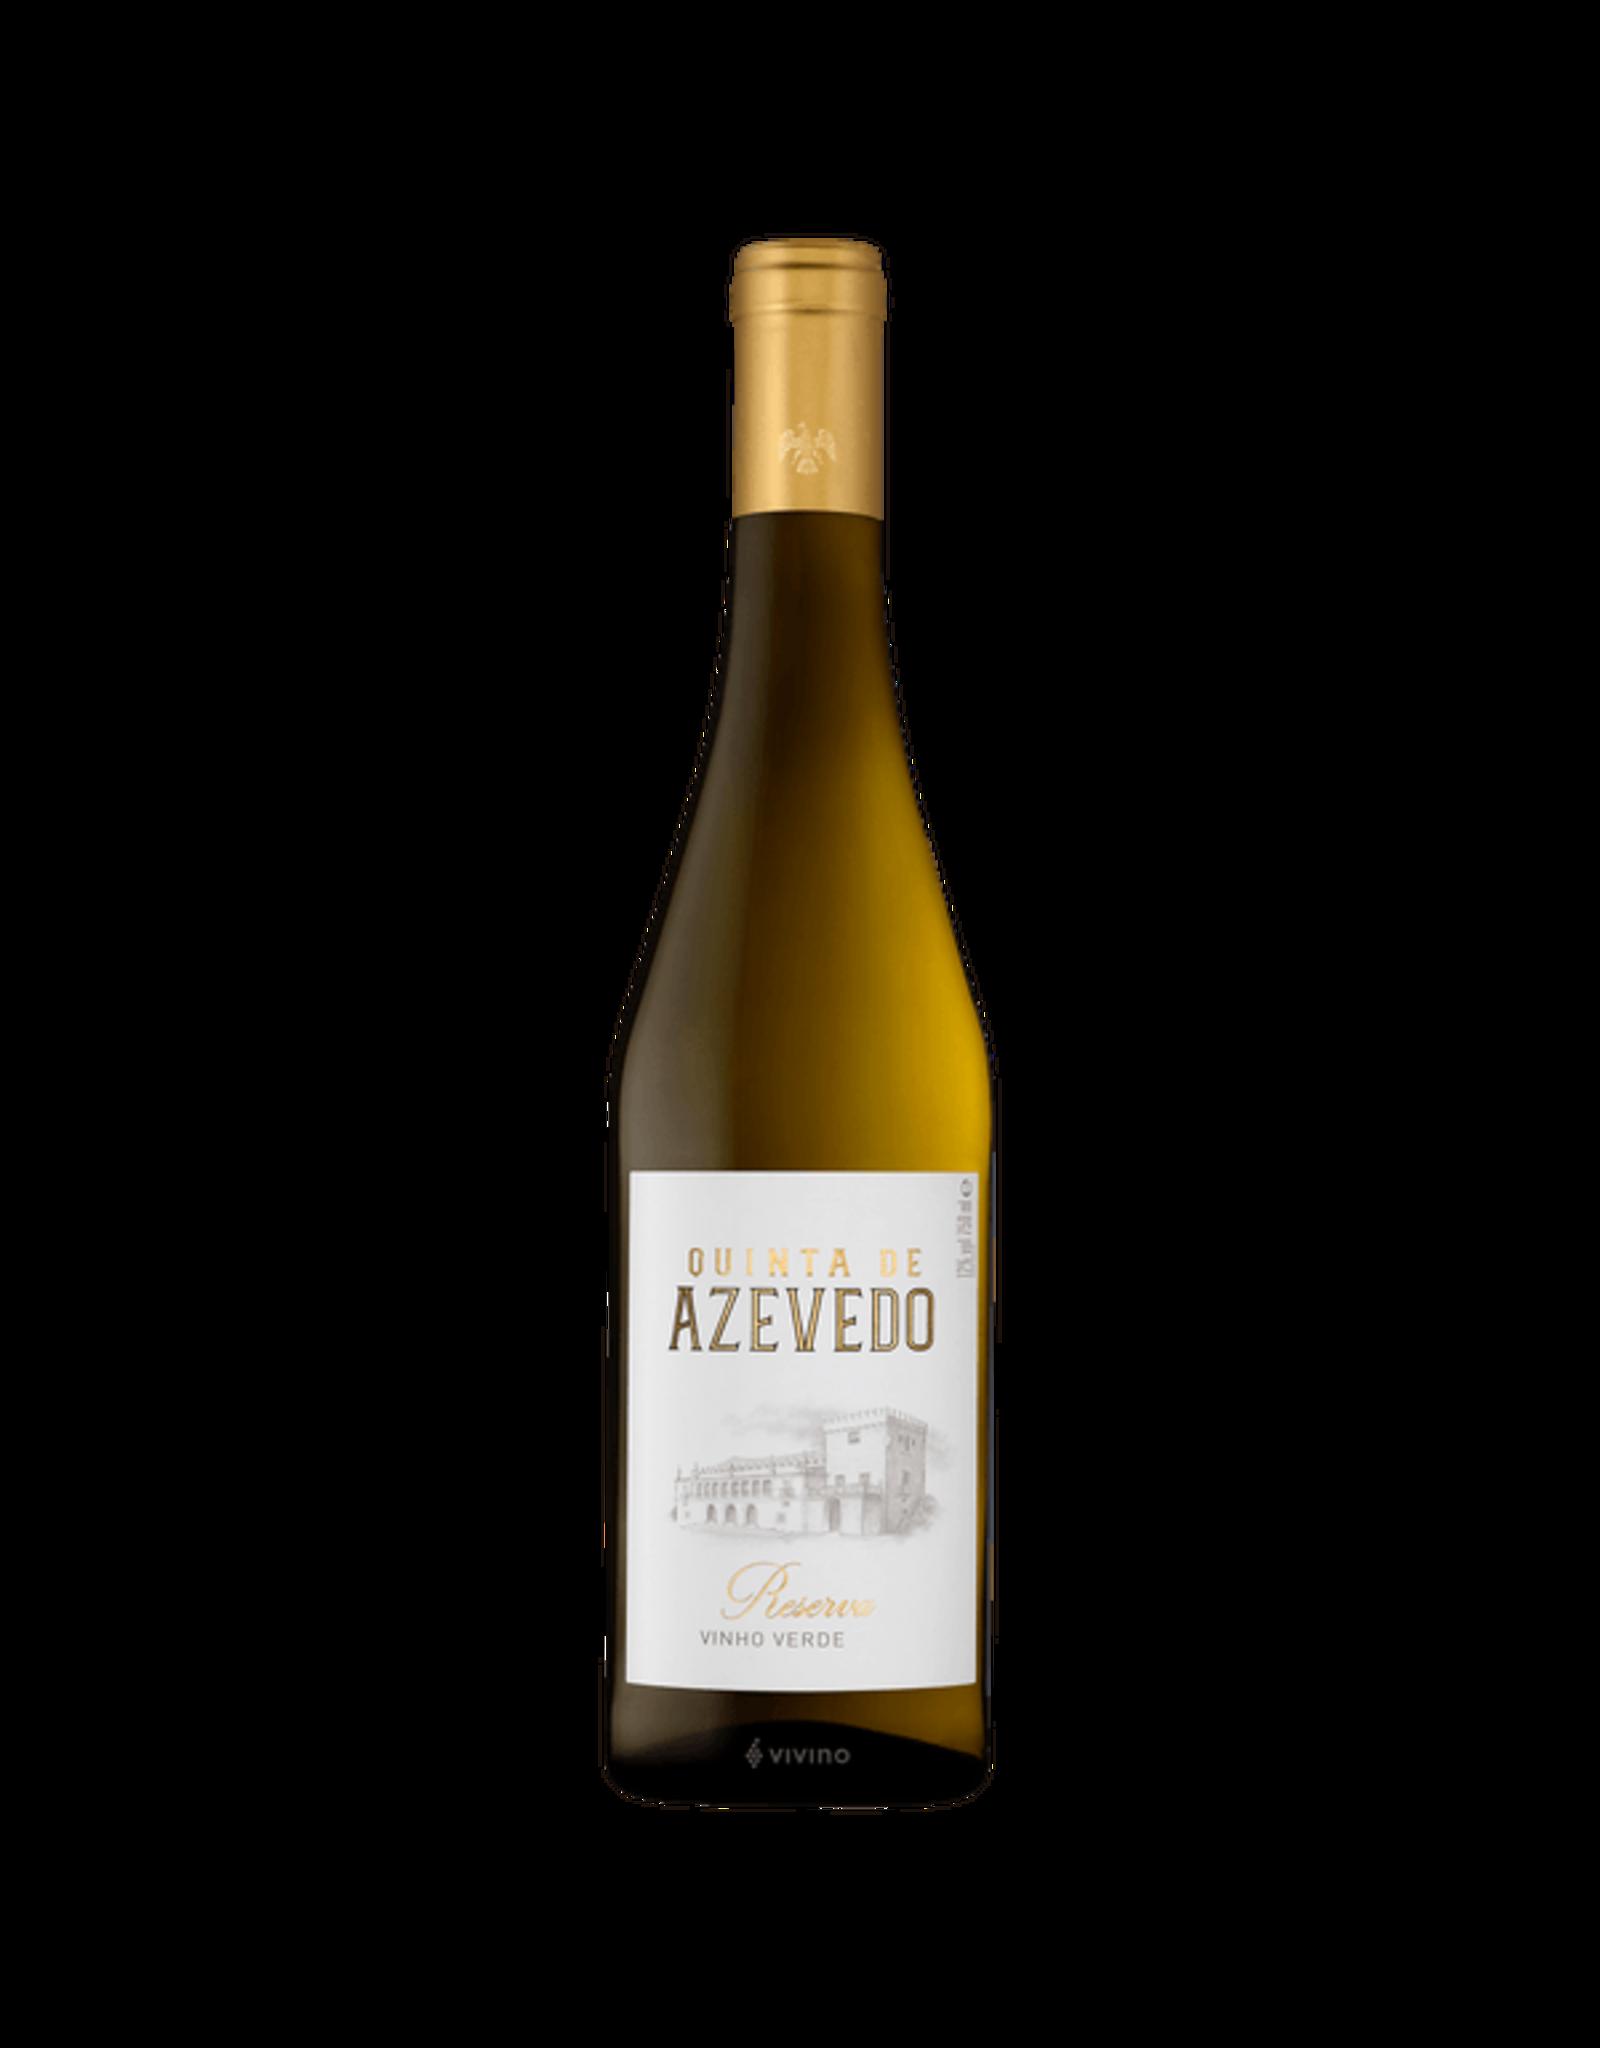 Azevedo Vinho Verde Reserva 2018